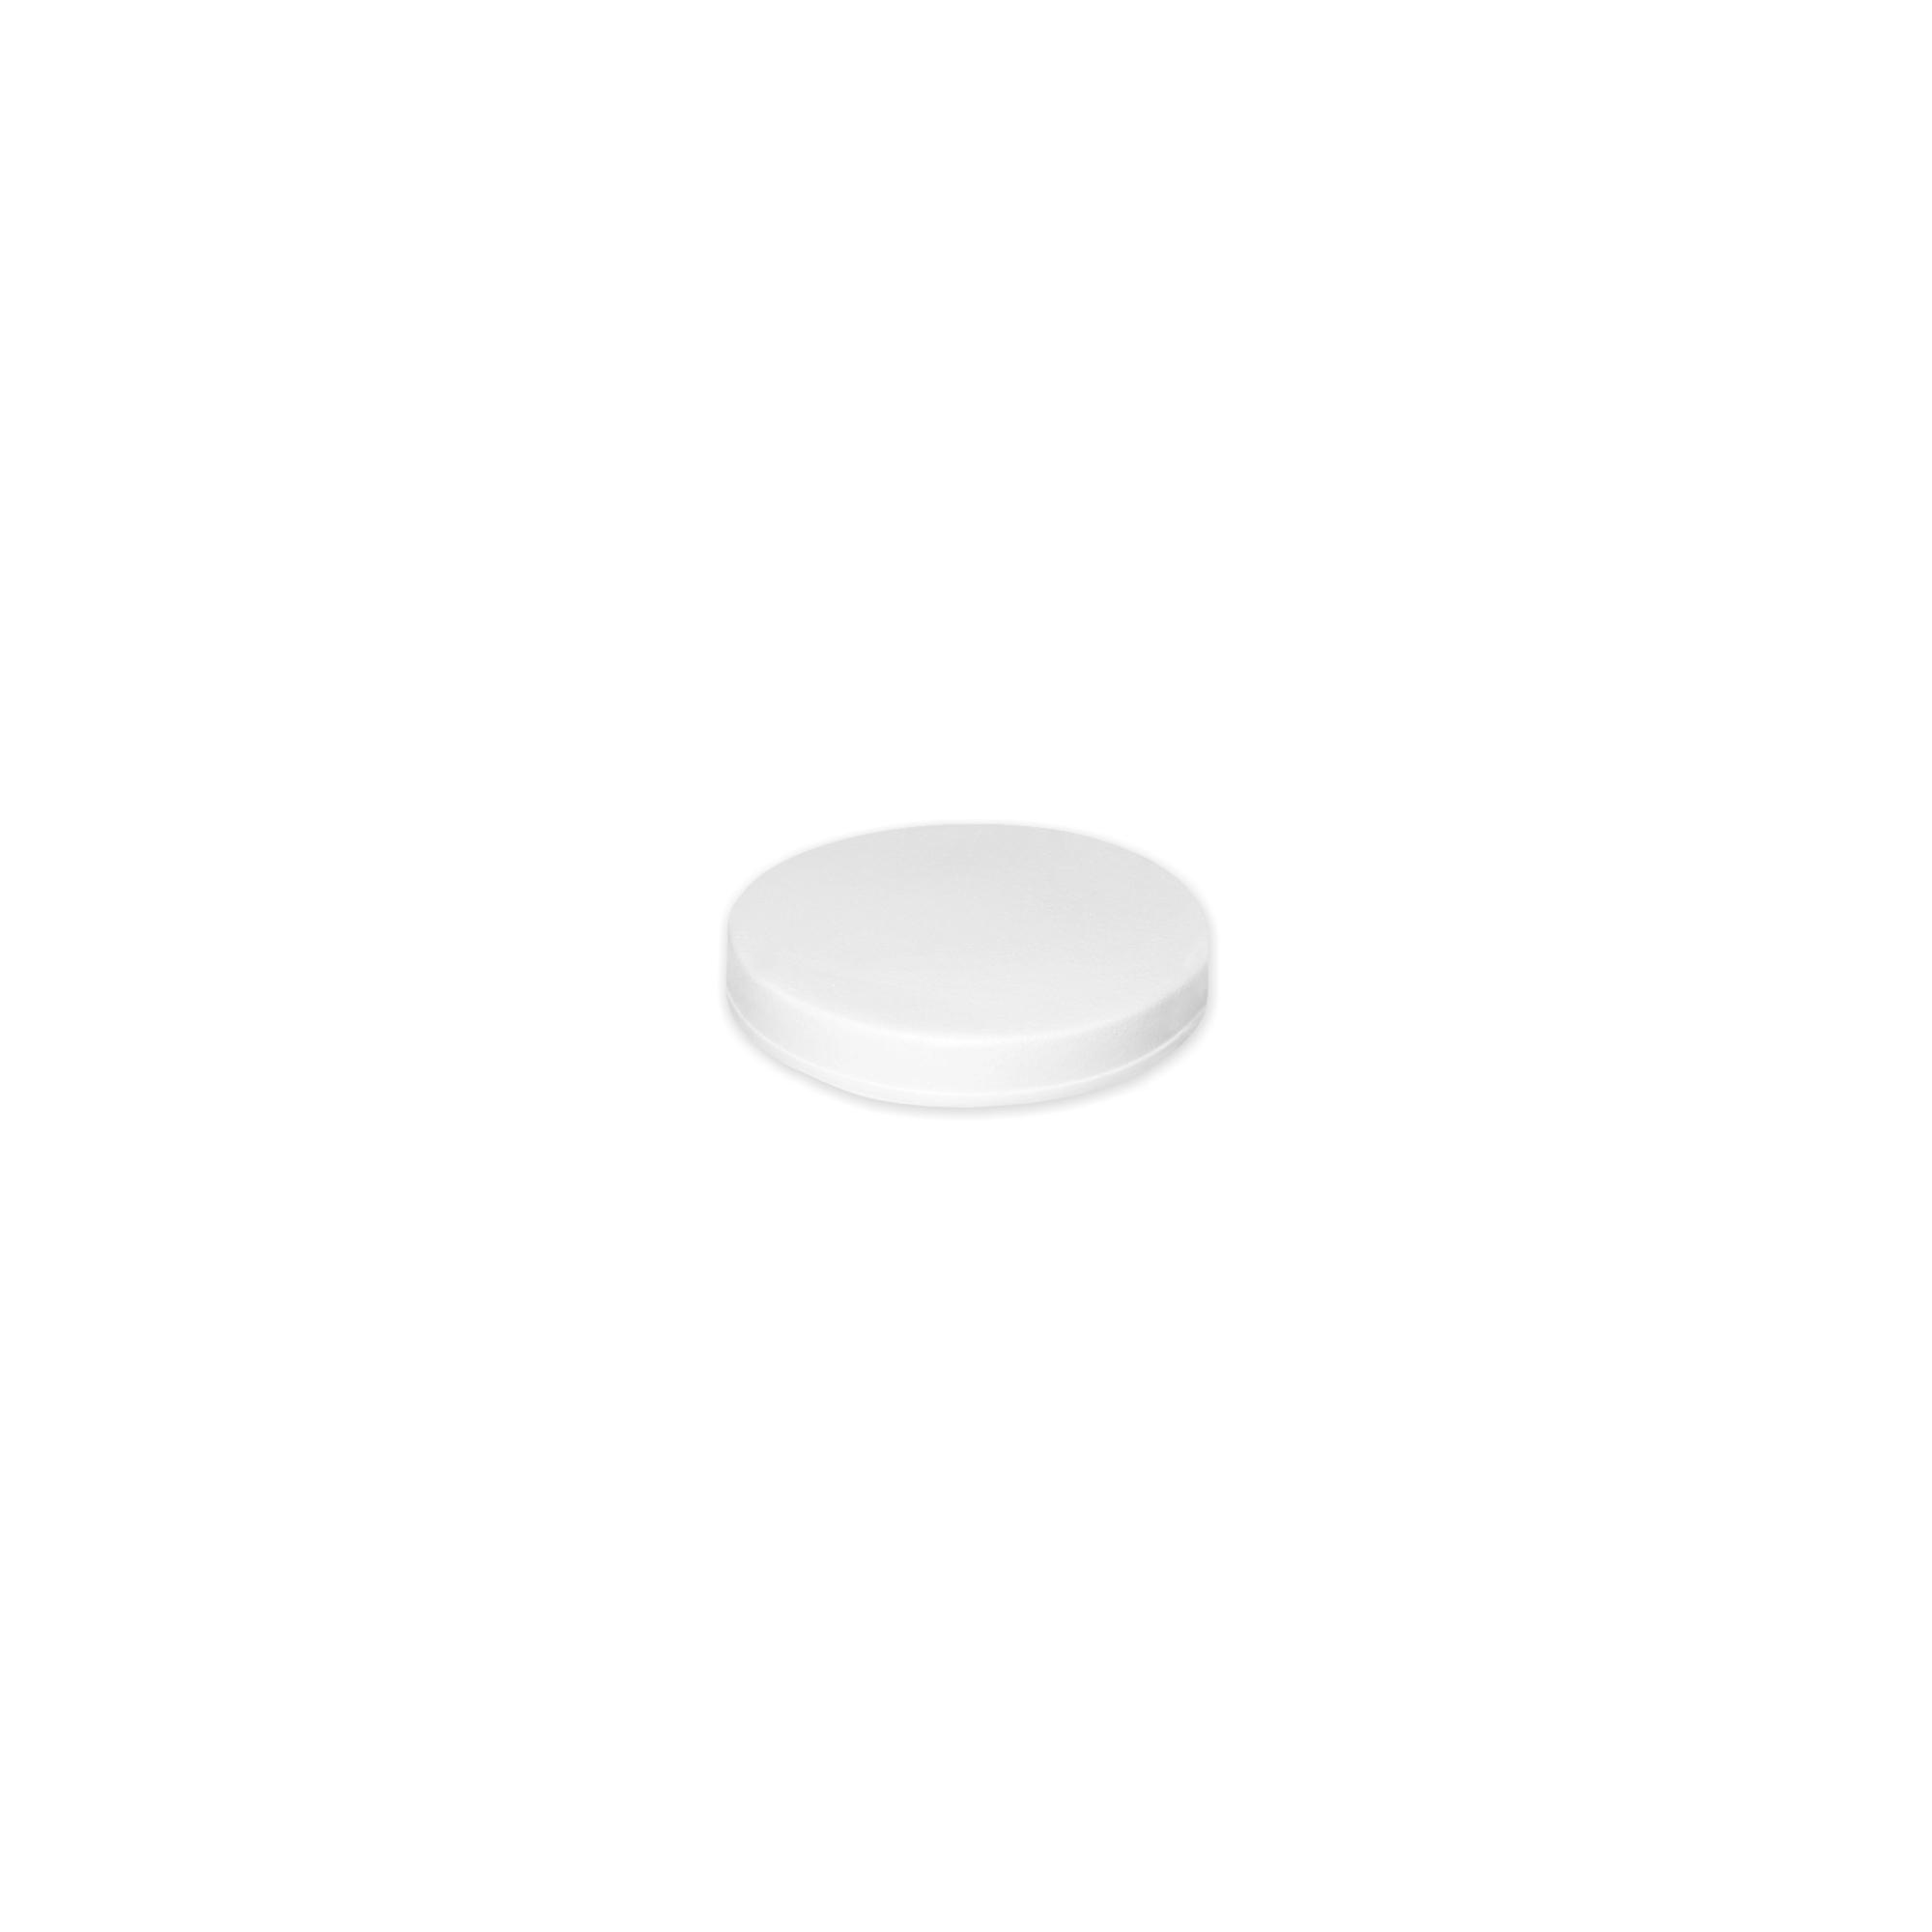 Tampa Plástica Branca para Potinho